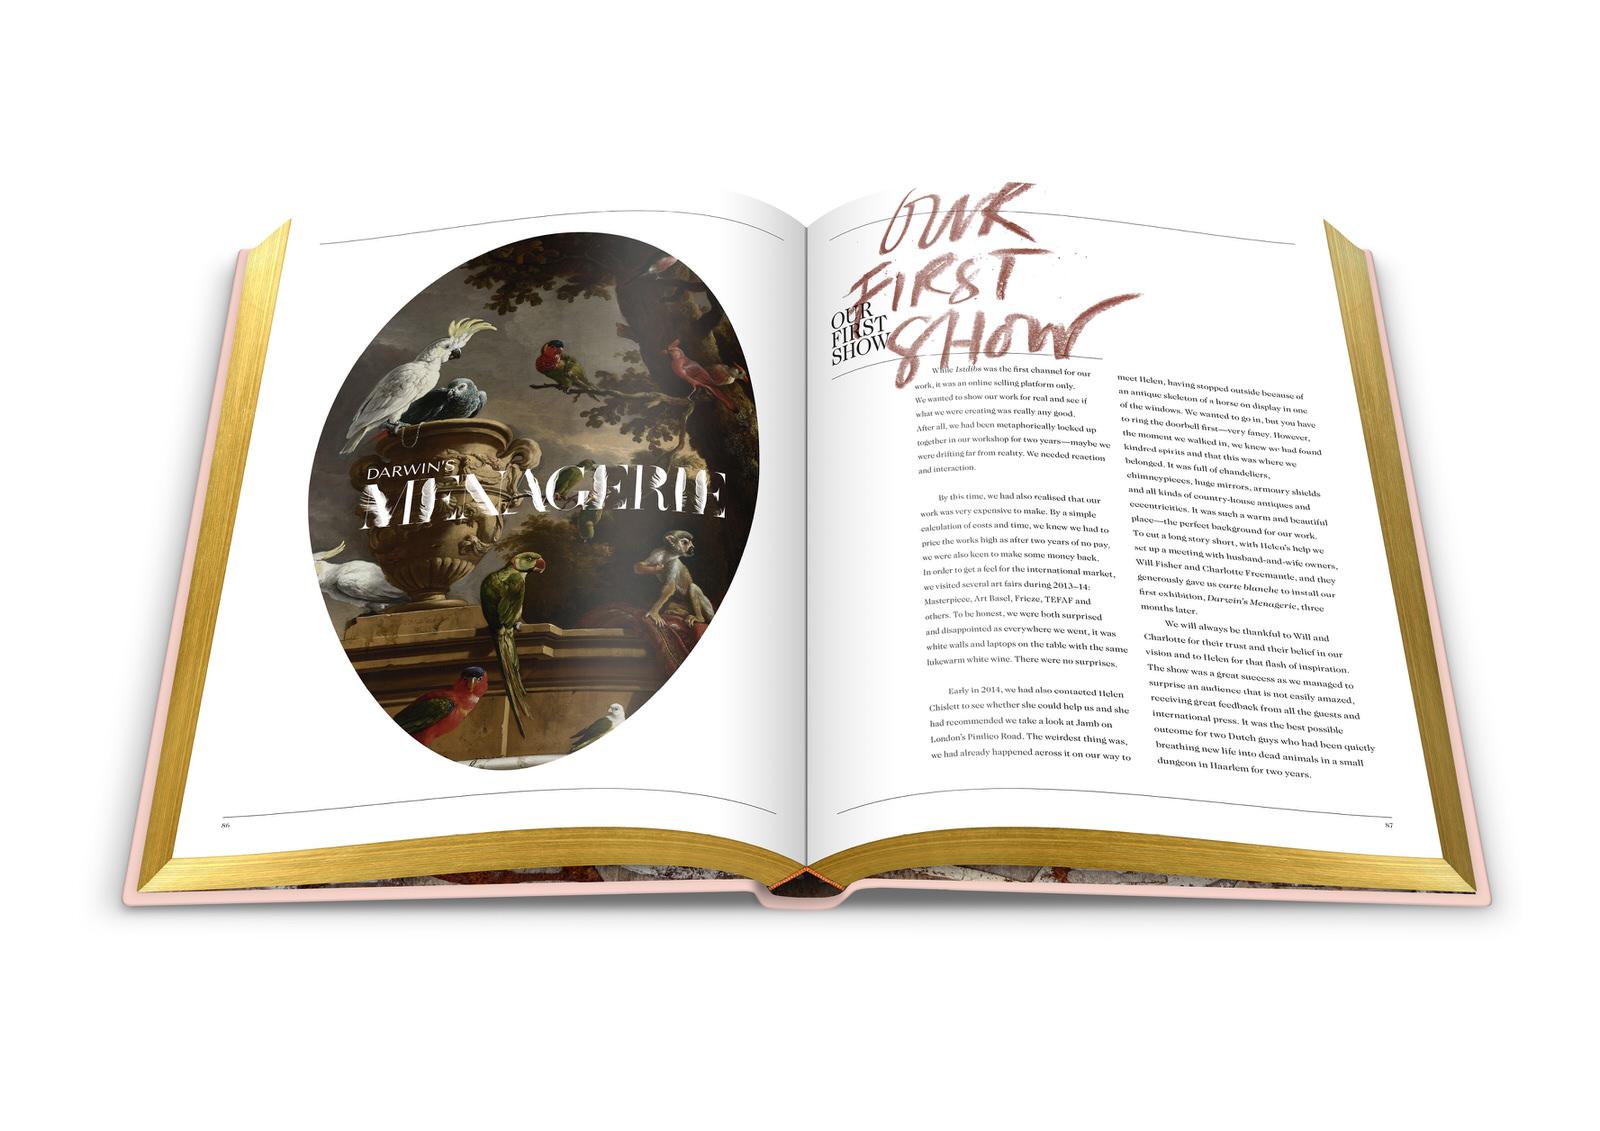 007-DSvT-Our-First-Book-Spread-First-Show.jpg